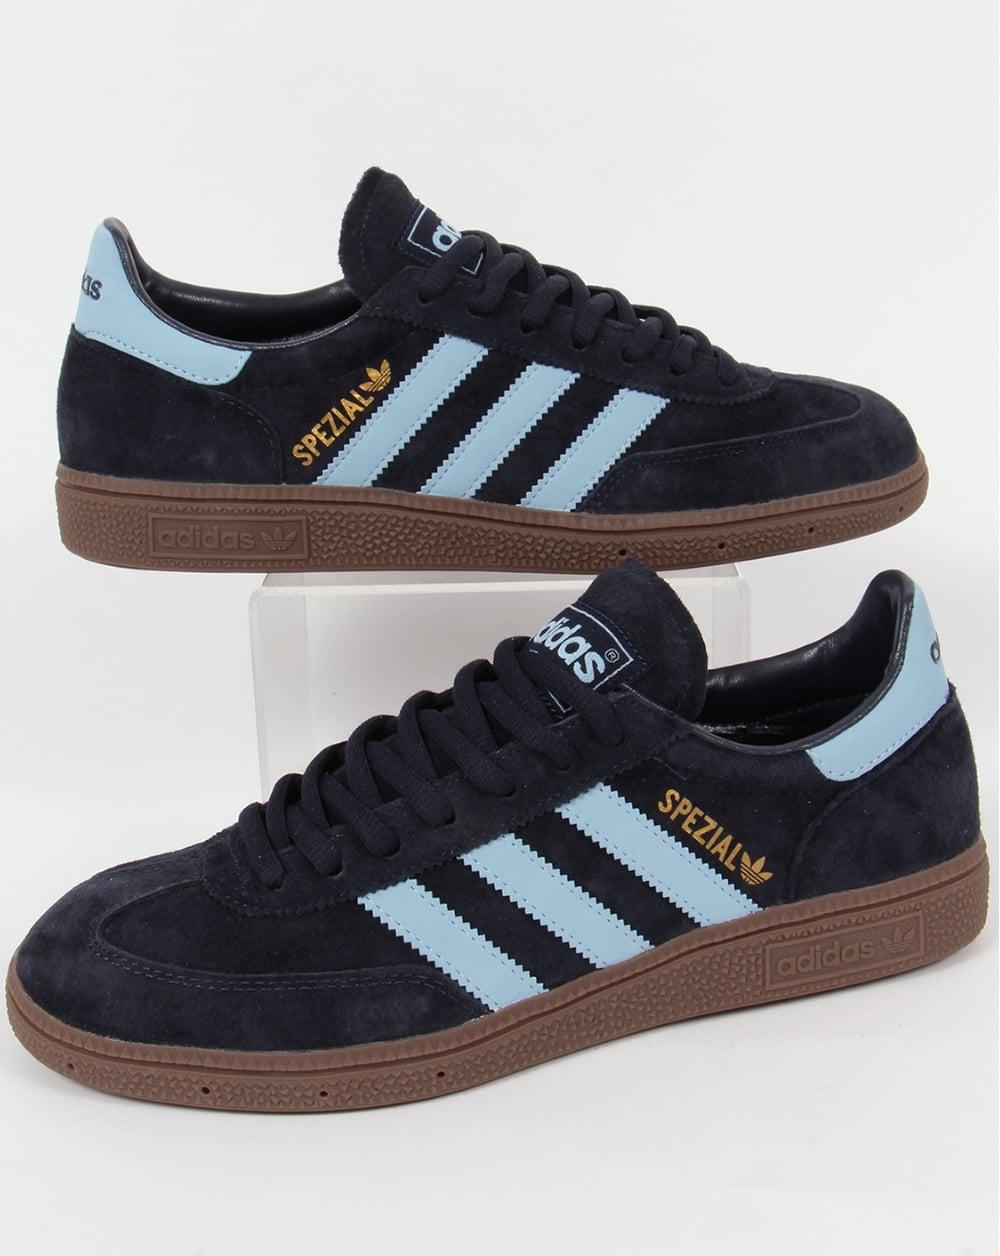 Adidas Originals Navy